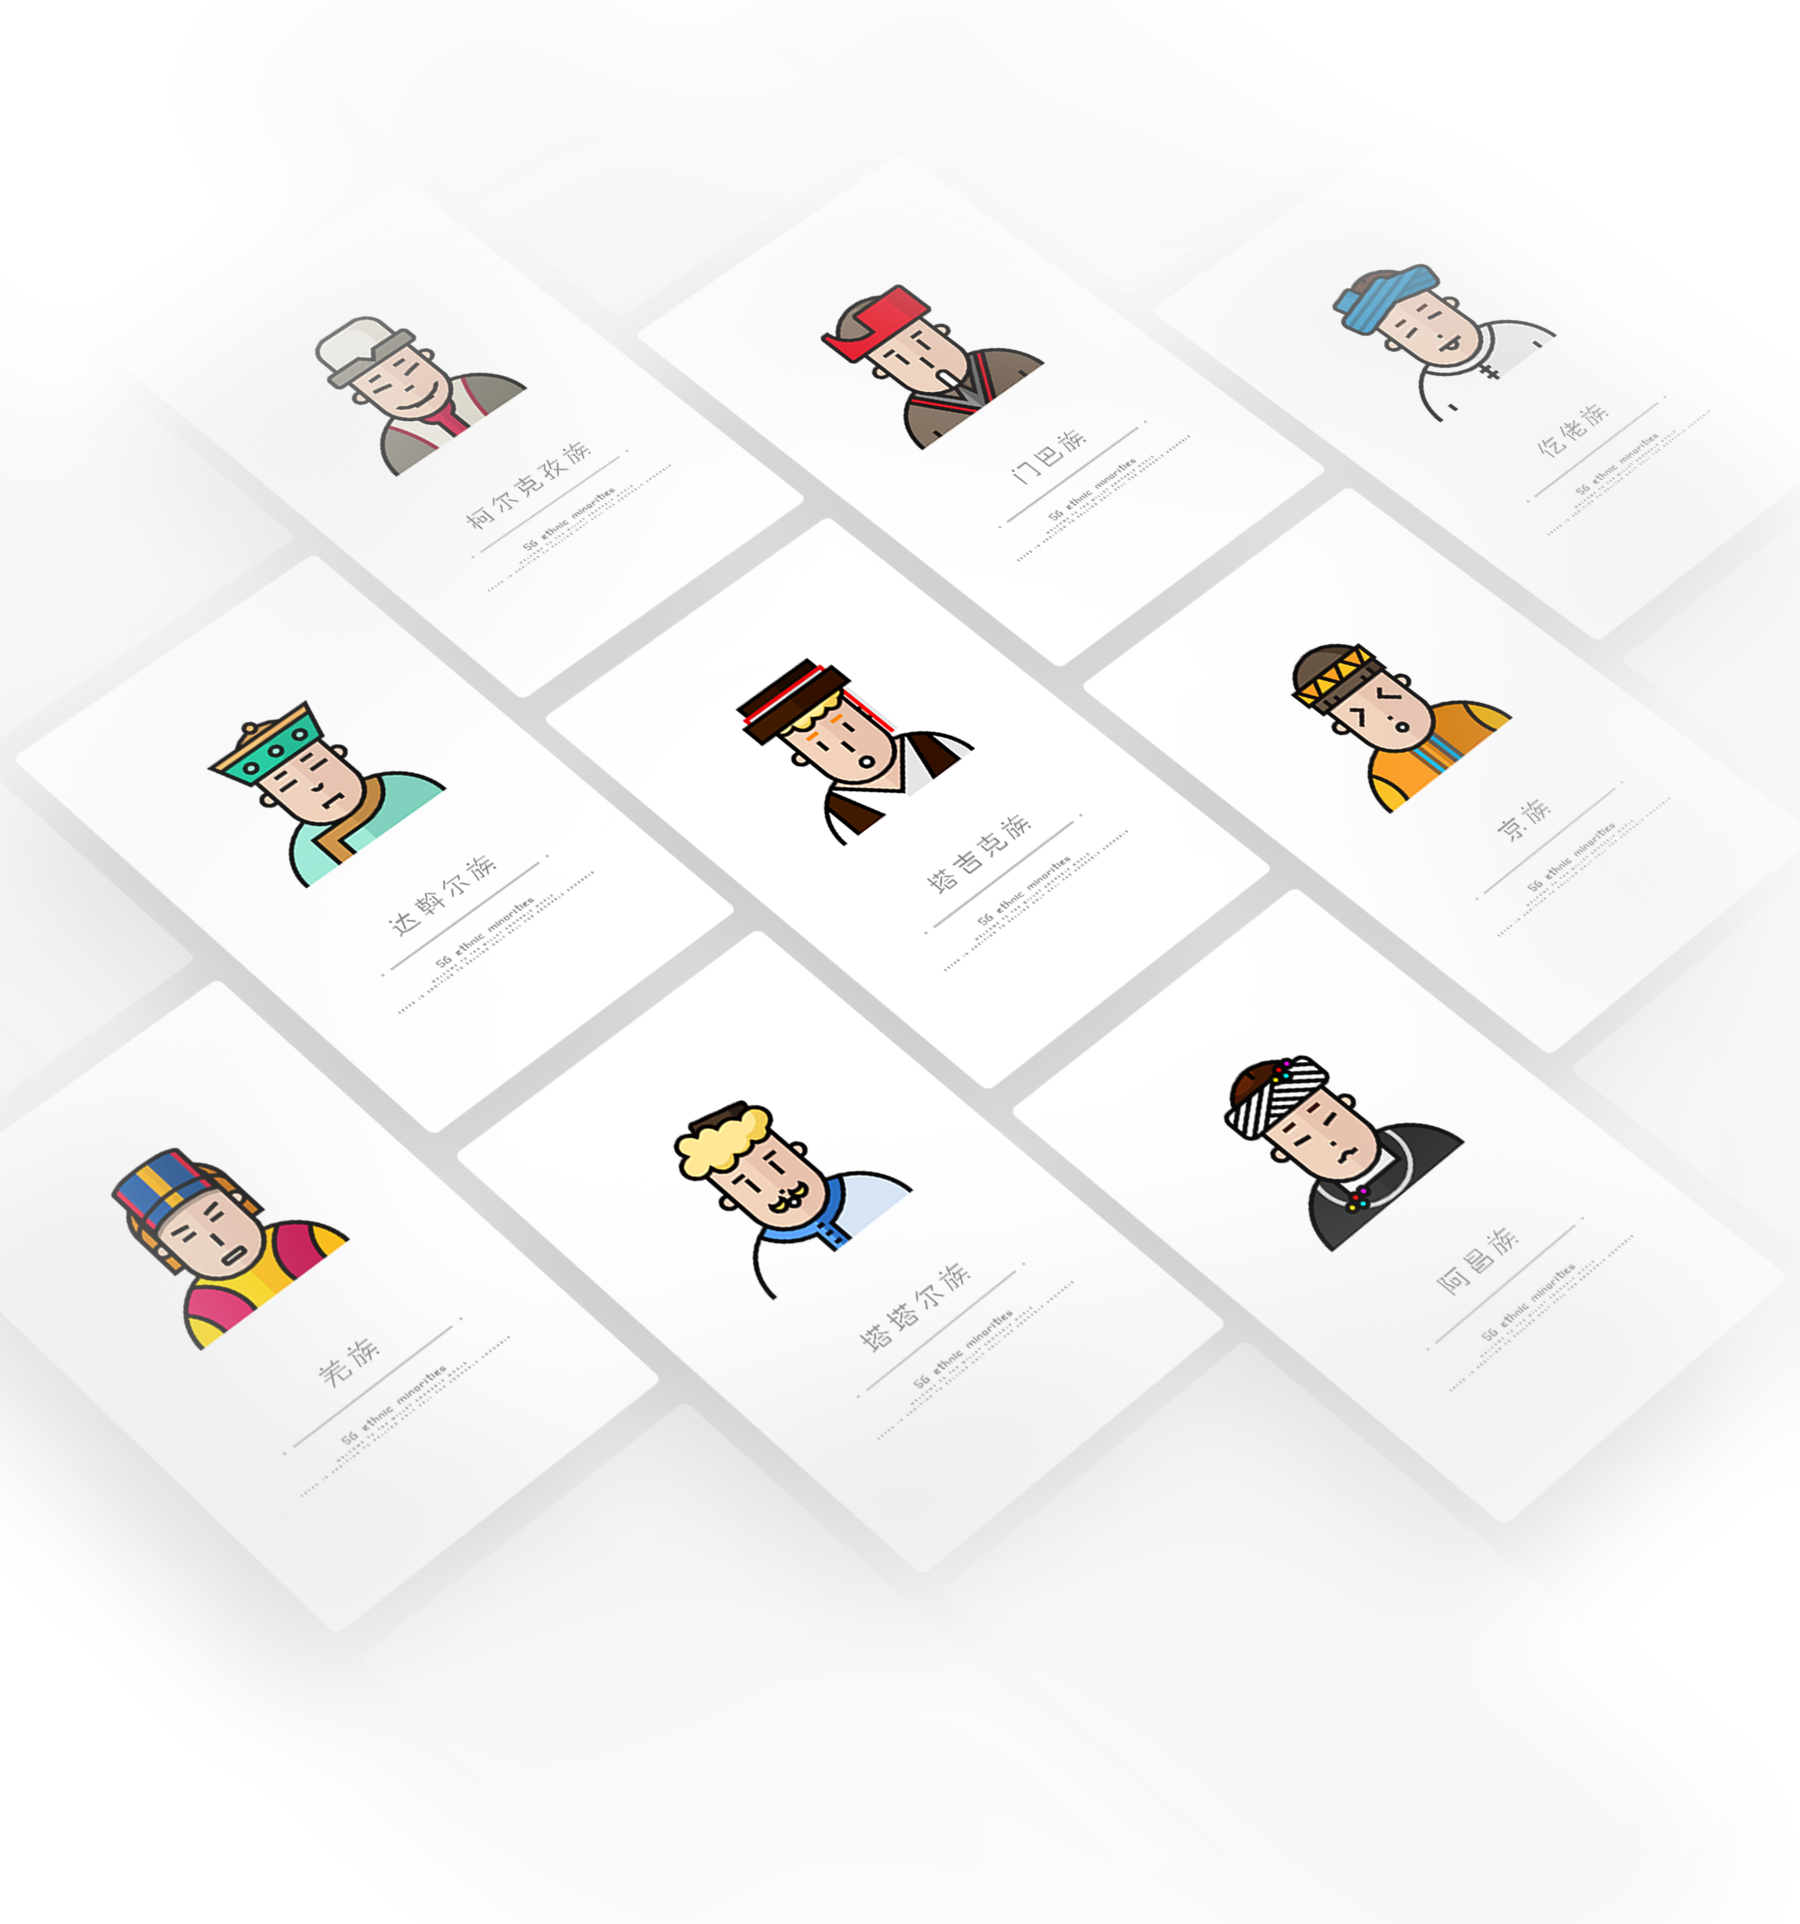 UI类-ICON设计 56个民族创意设计